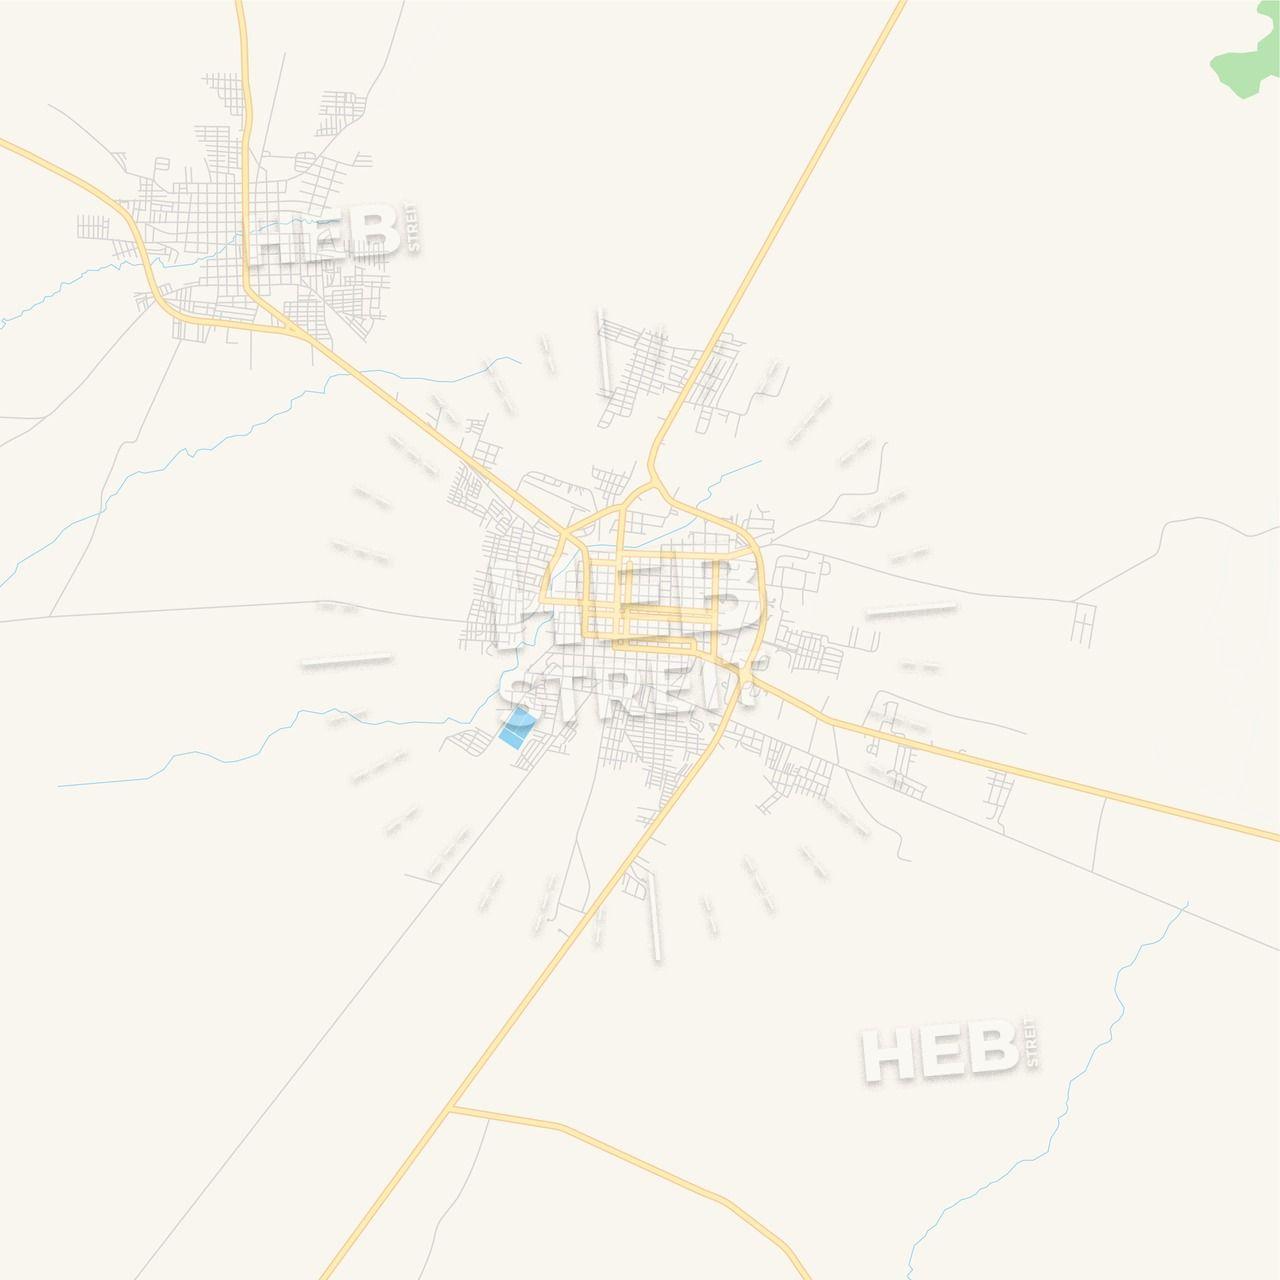 Empty vector map of Chinandega, Chinandega, Nicaragua | Maps ... on north country of nicaragua, welcome to nicaragua, hotels in chinandega nicaragua, highway map nicaragua, a current map nicaragua, fotos de nicaragua, map of limon, limon nicaragua, rancheria chinandega nicaragua, chichigalpa nicaragua, map of poneloya and las penitas, villanueva nicaragua,